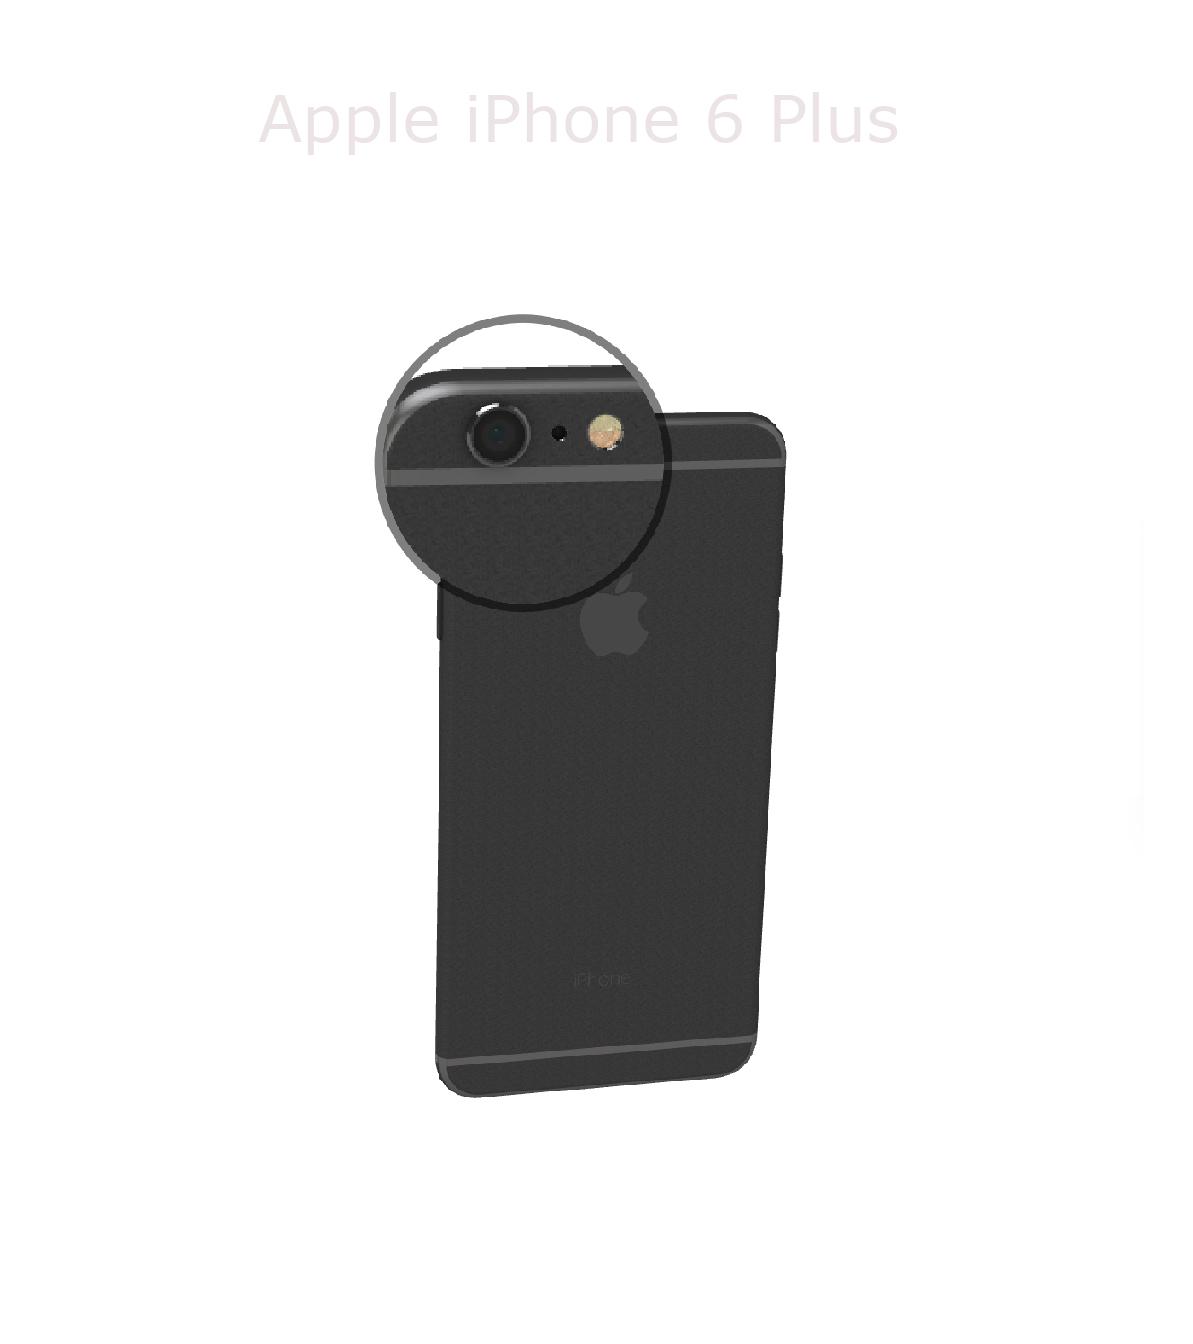 Laga kamera iPhone 6 plus